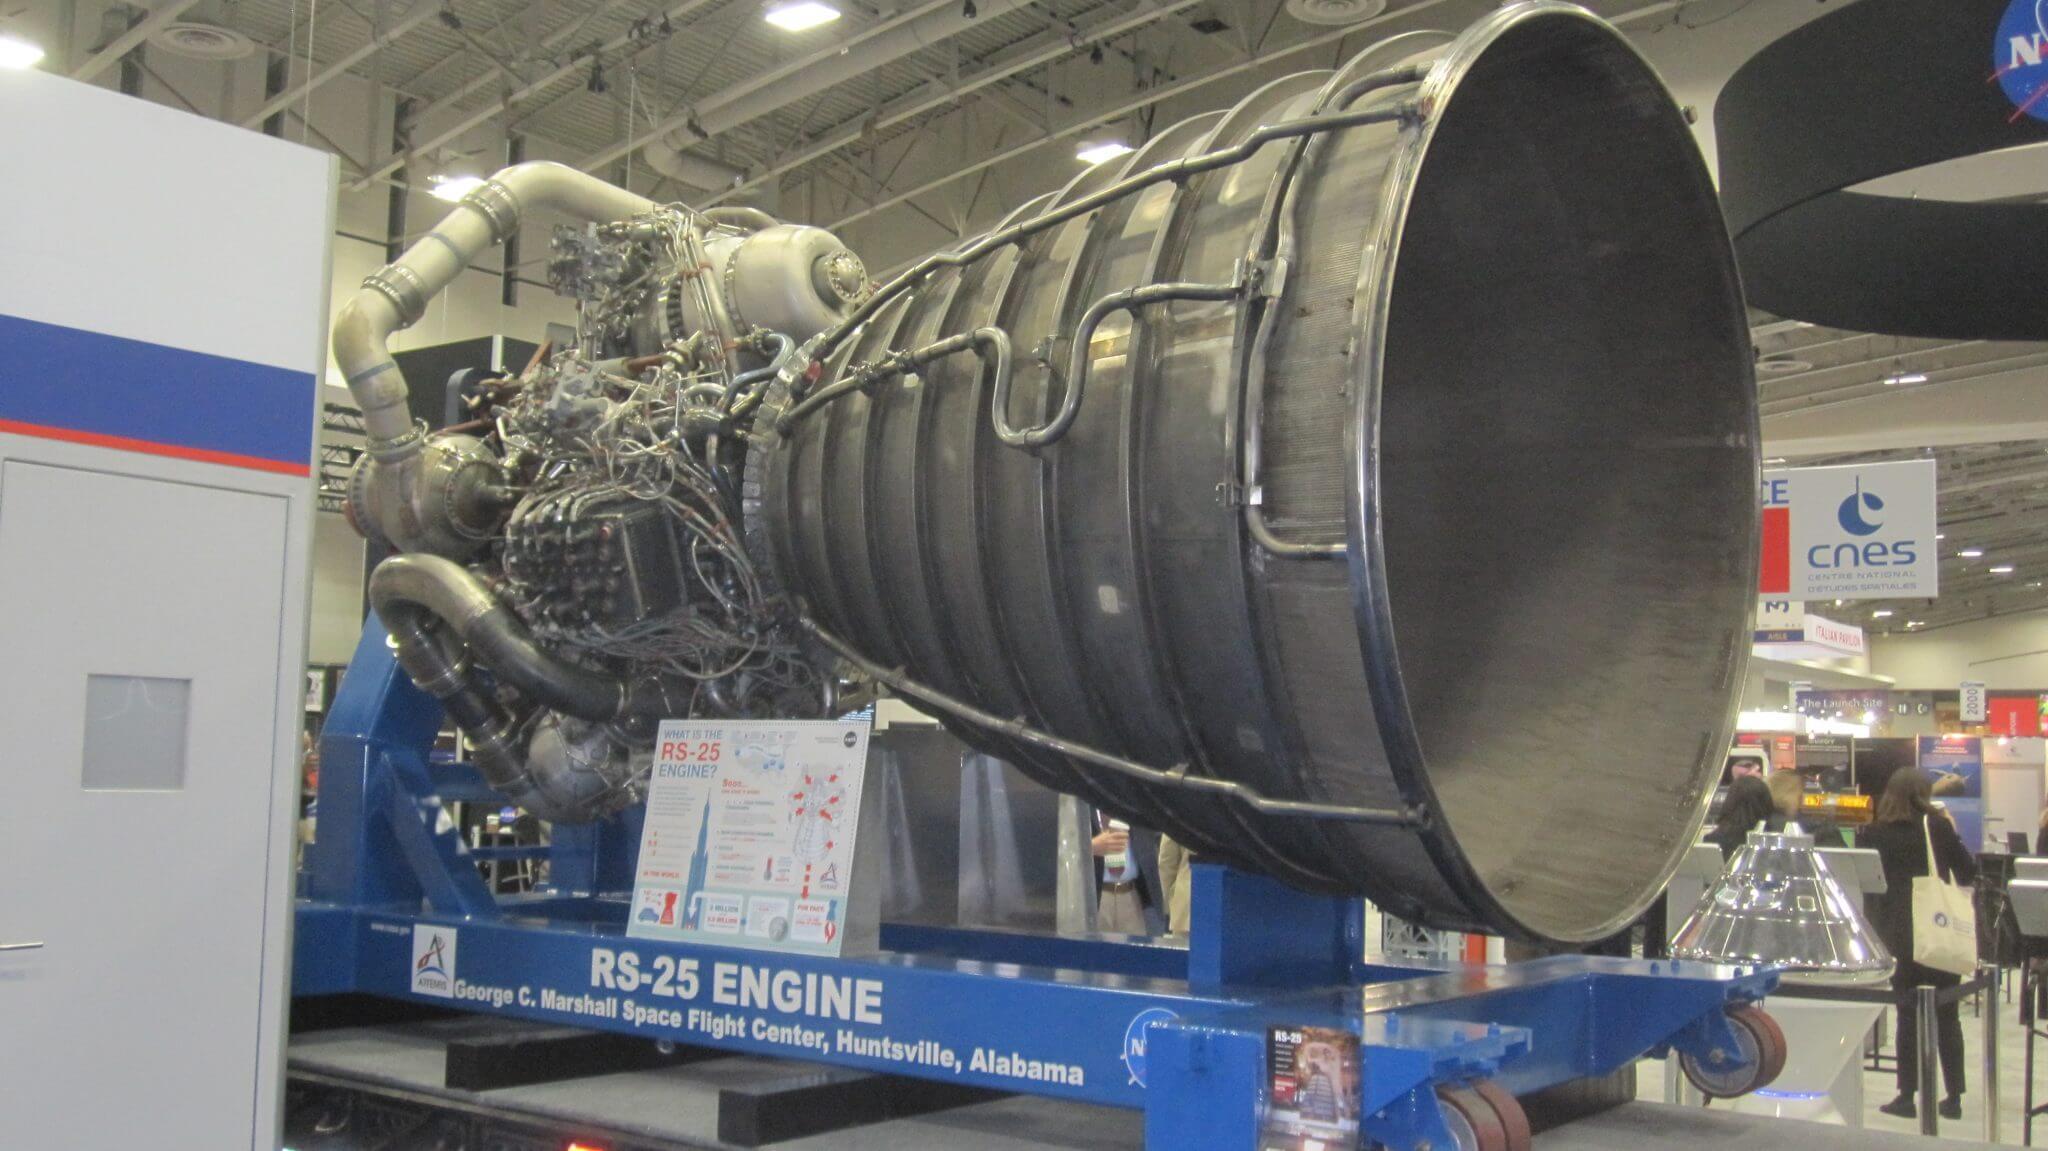 Lockheed Martin announces intention to acquire Aerojet Rocketdyne for US$4.4 billion